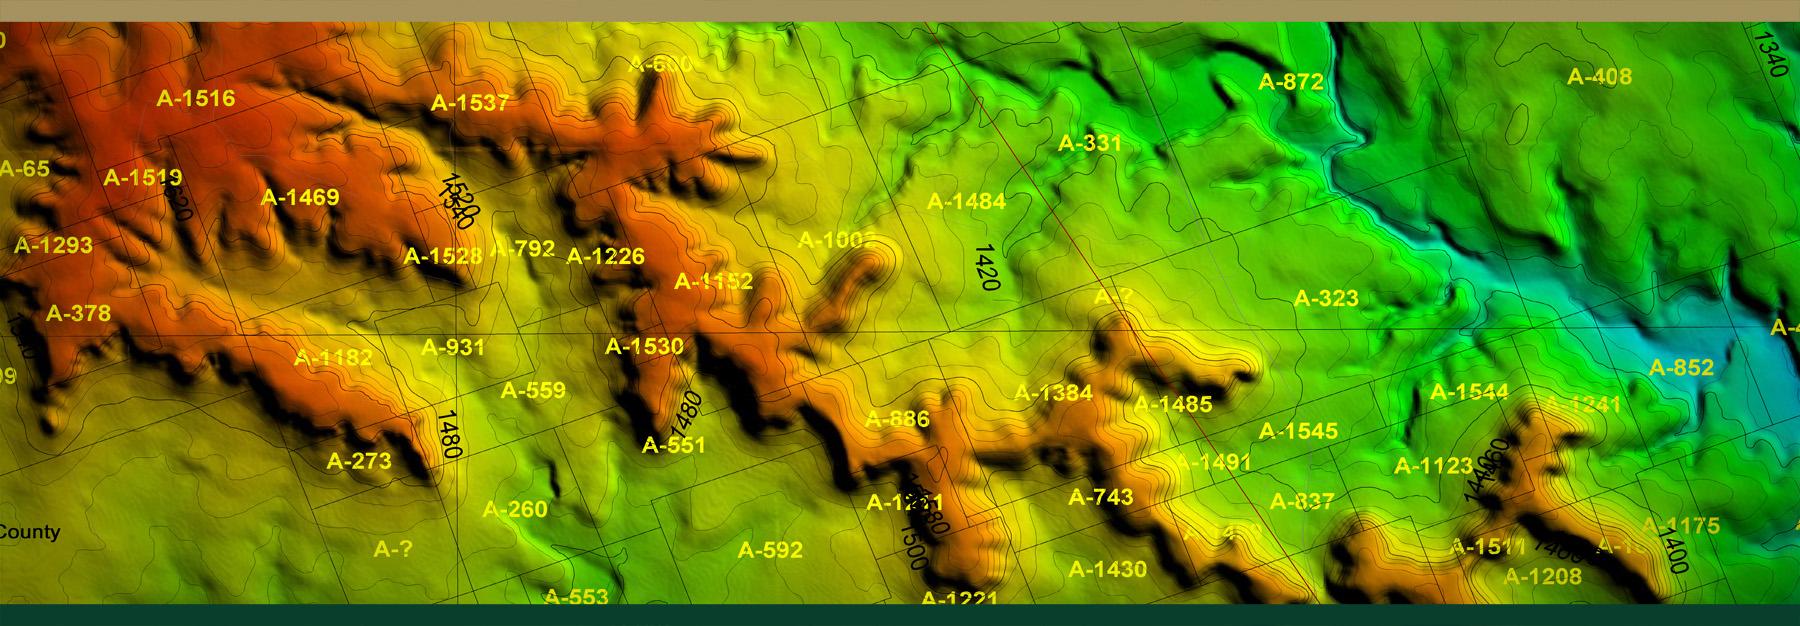 GeographicInformationSystems.jpg